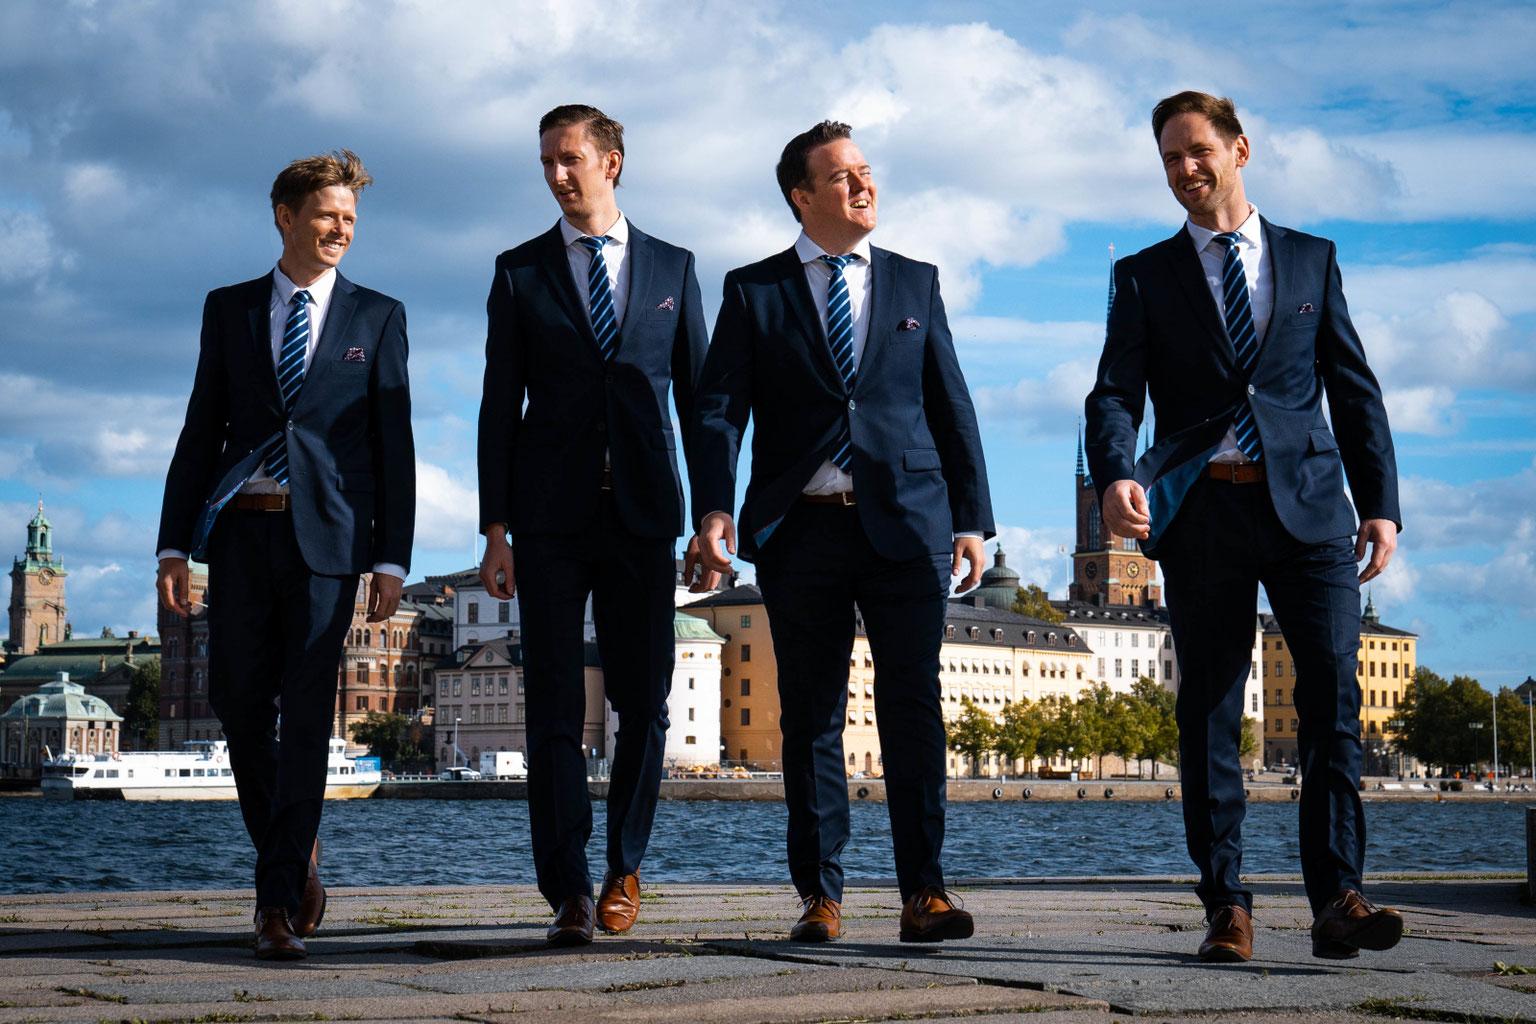 Ringmasters weltmeisterliches aus stockholm kulturig for Stockholm veranstaltungen